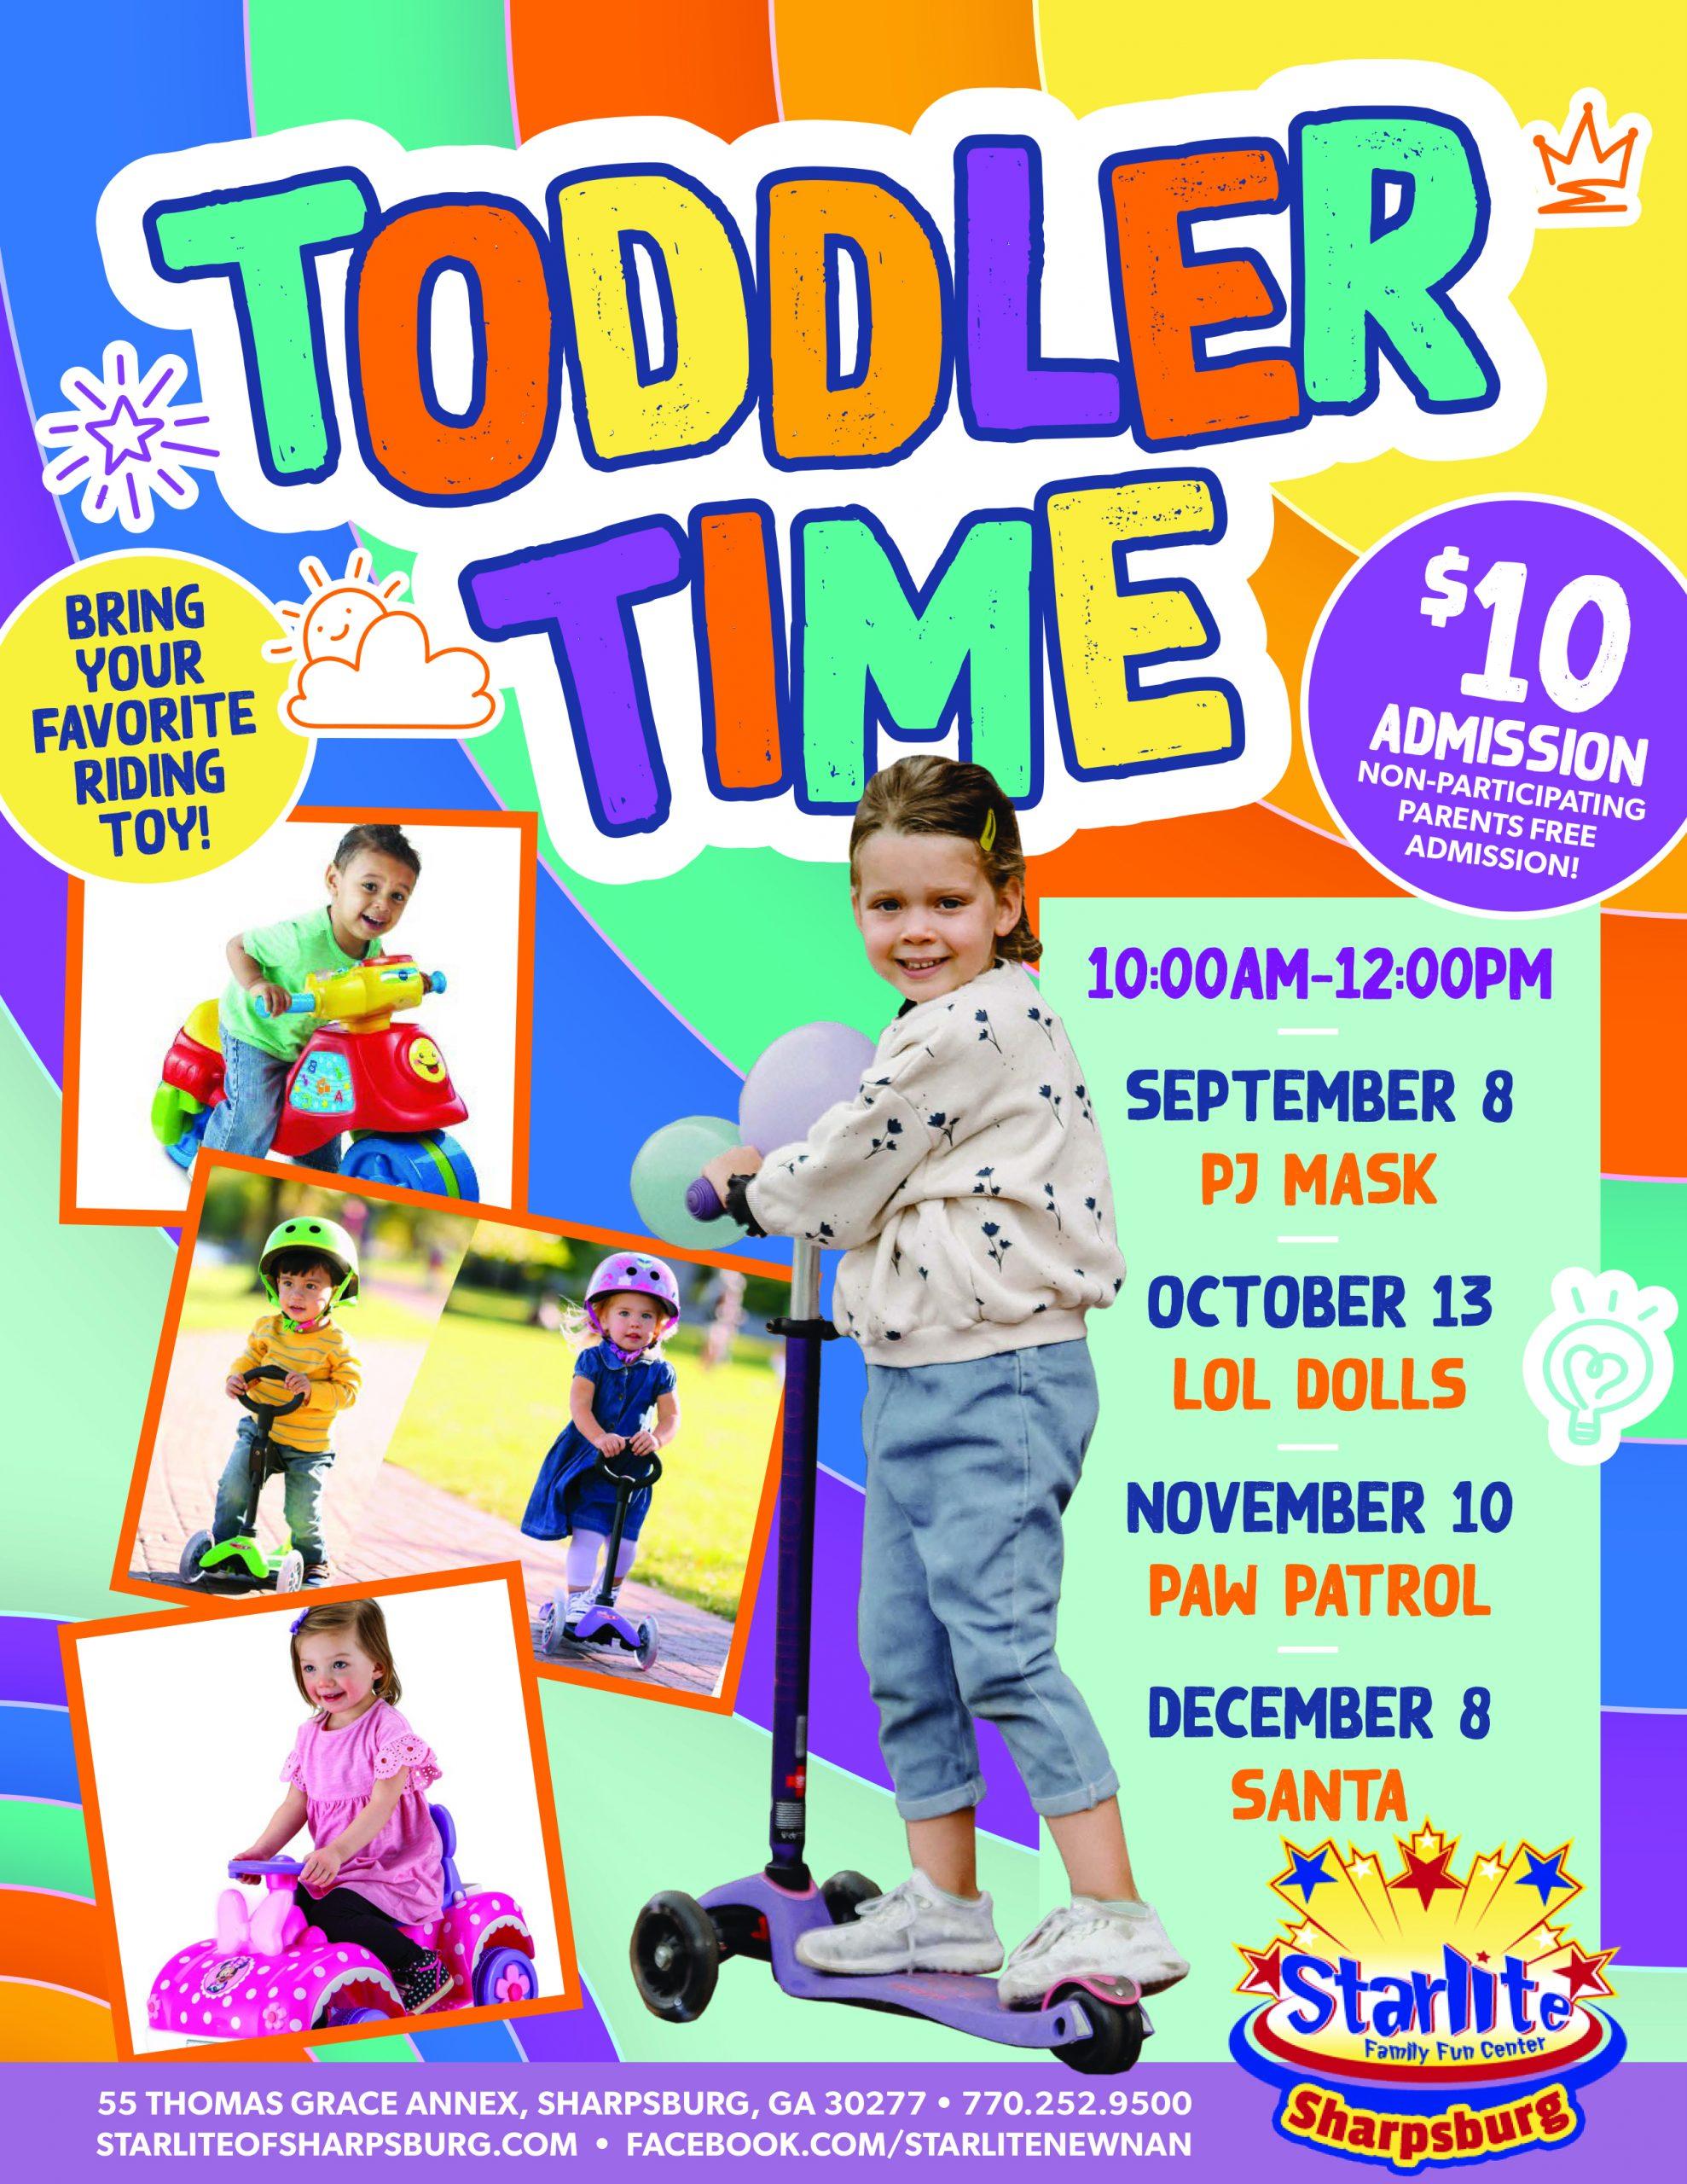 GA21-021 Toddler Time Flyer-Sharpsburg